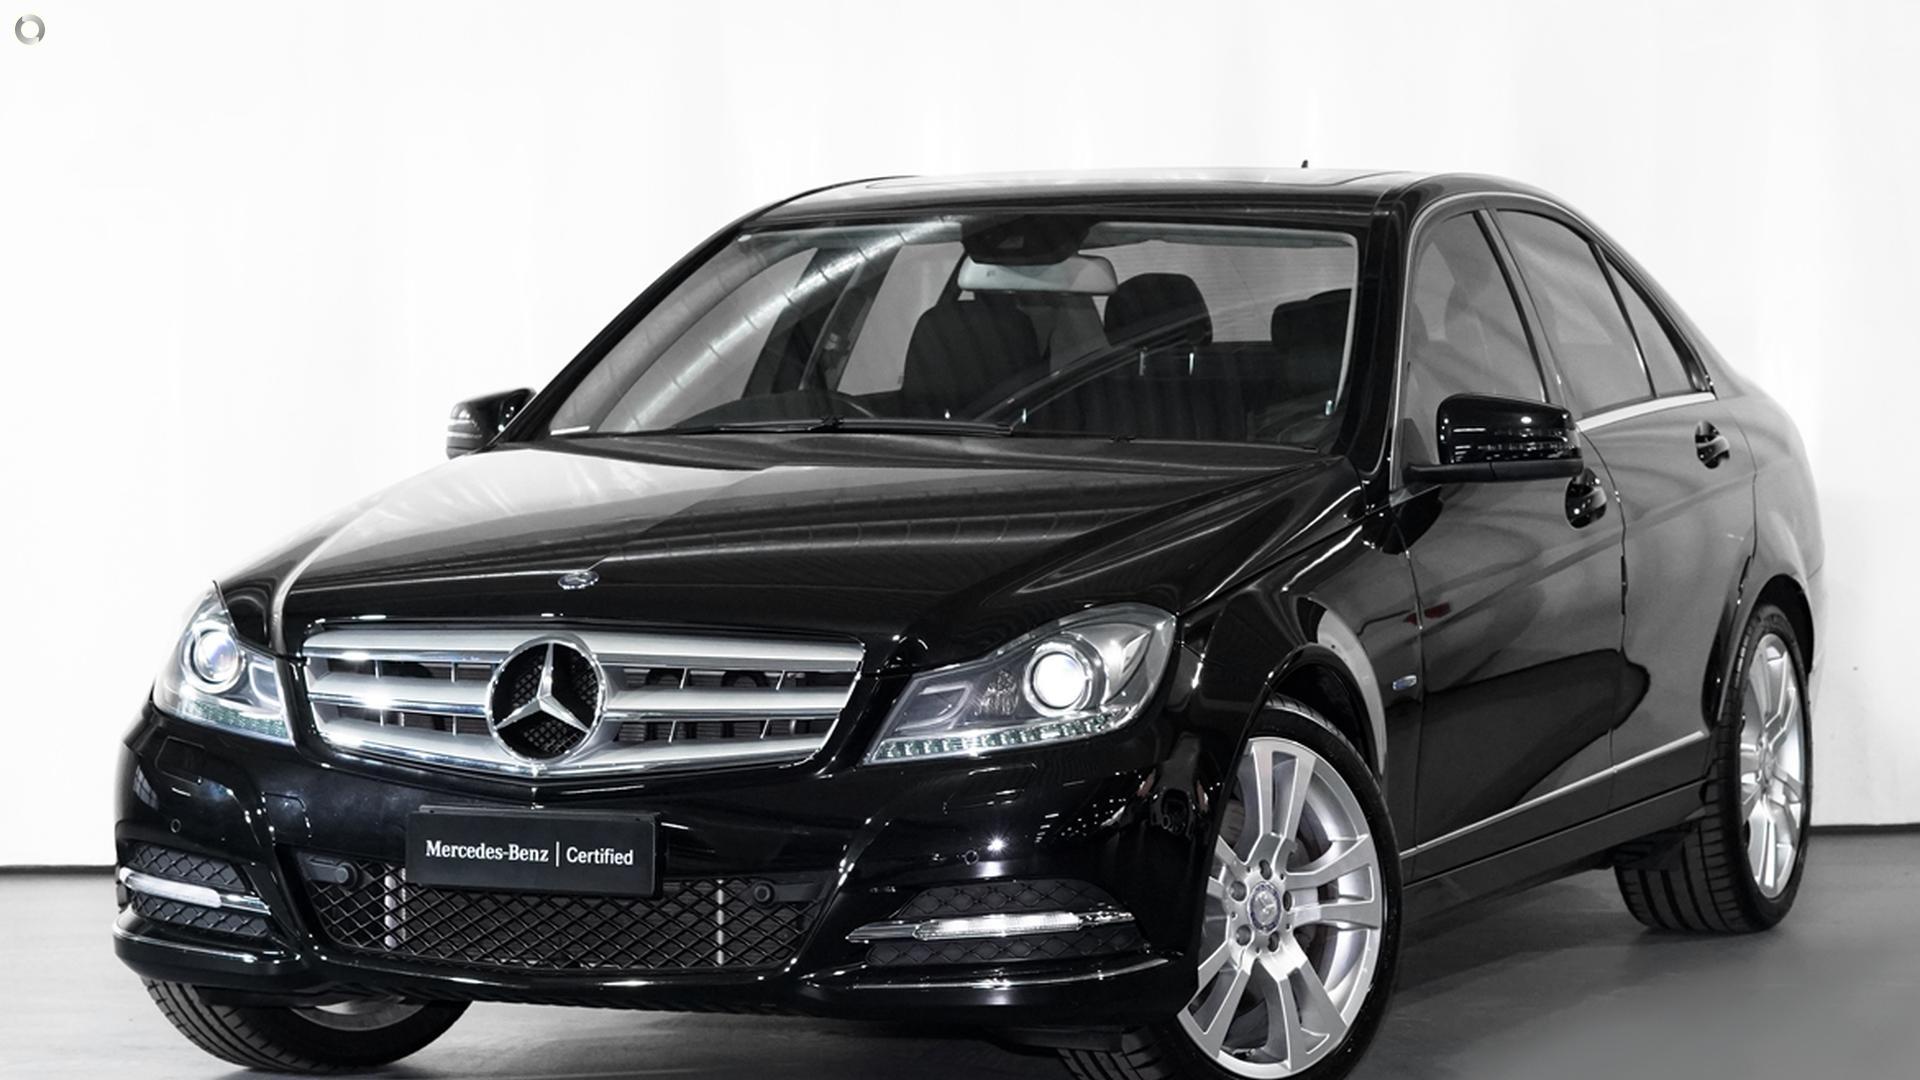 2011 Mercedes-Benz C 300 BLUEEFFICIENCY AVANTGARDE Sedan